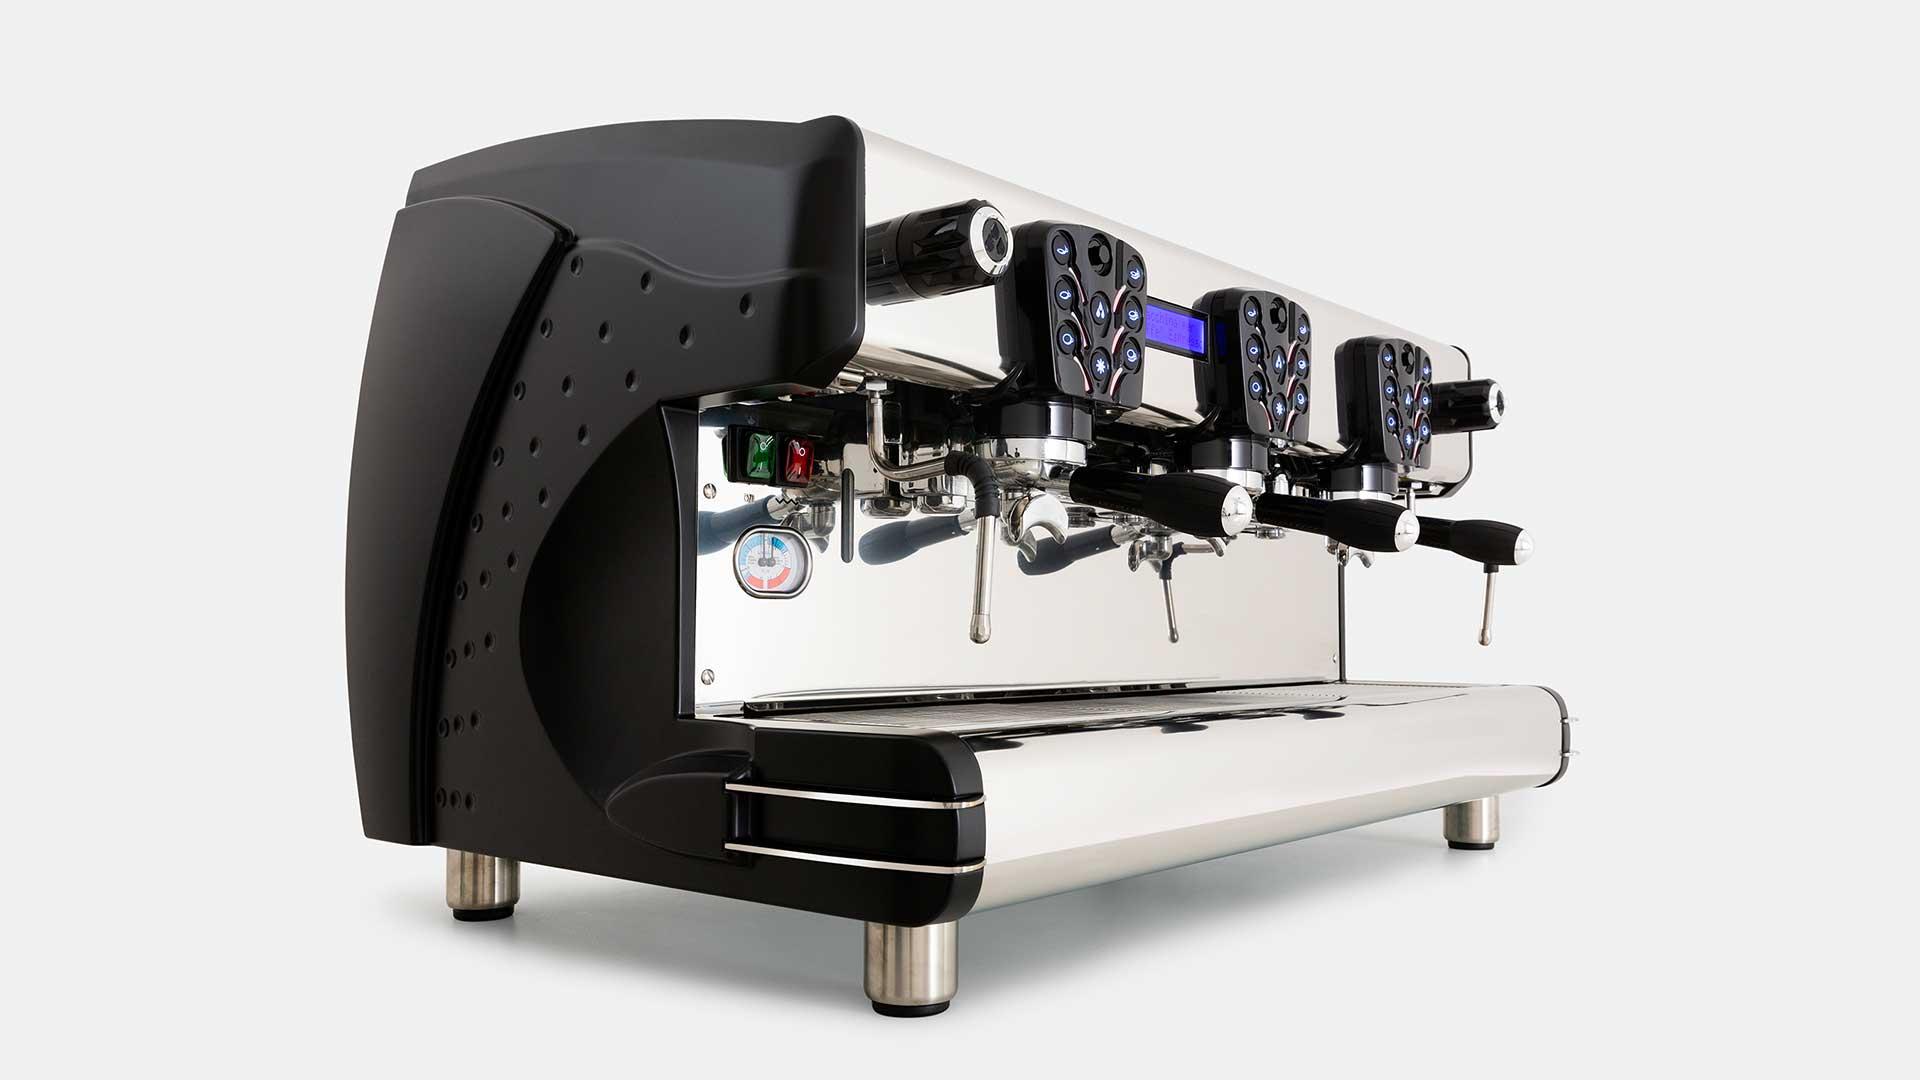 TOSCA-la-scala-macchina-espresso-design-3gruppi